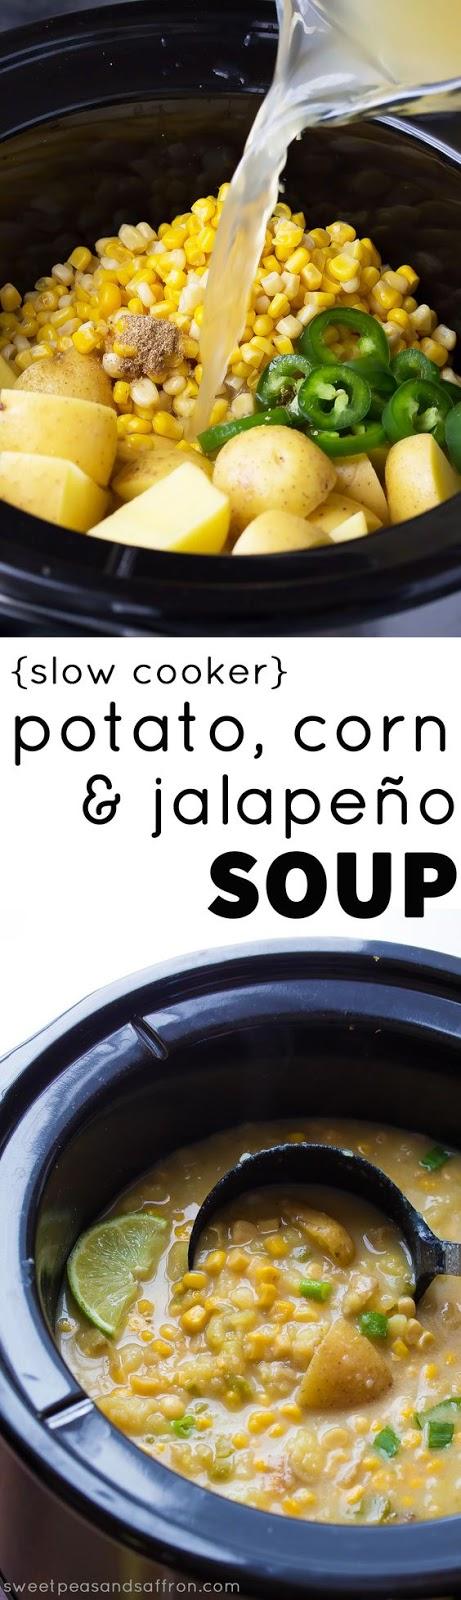 ★★★★☆ 5380 ratings      | Slow Cooker Potato, Corn and Jalapeno Soup #Slow #Cooker #Potato #Corn #Jalapeno #Soup